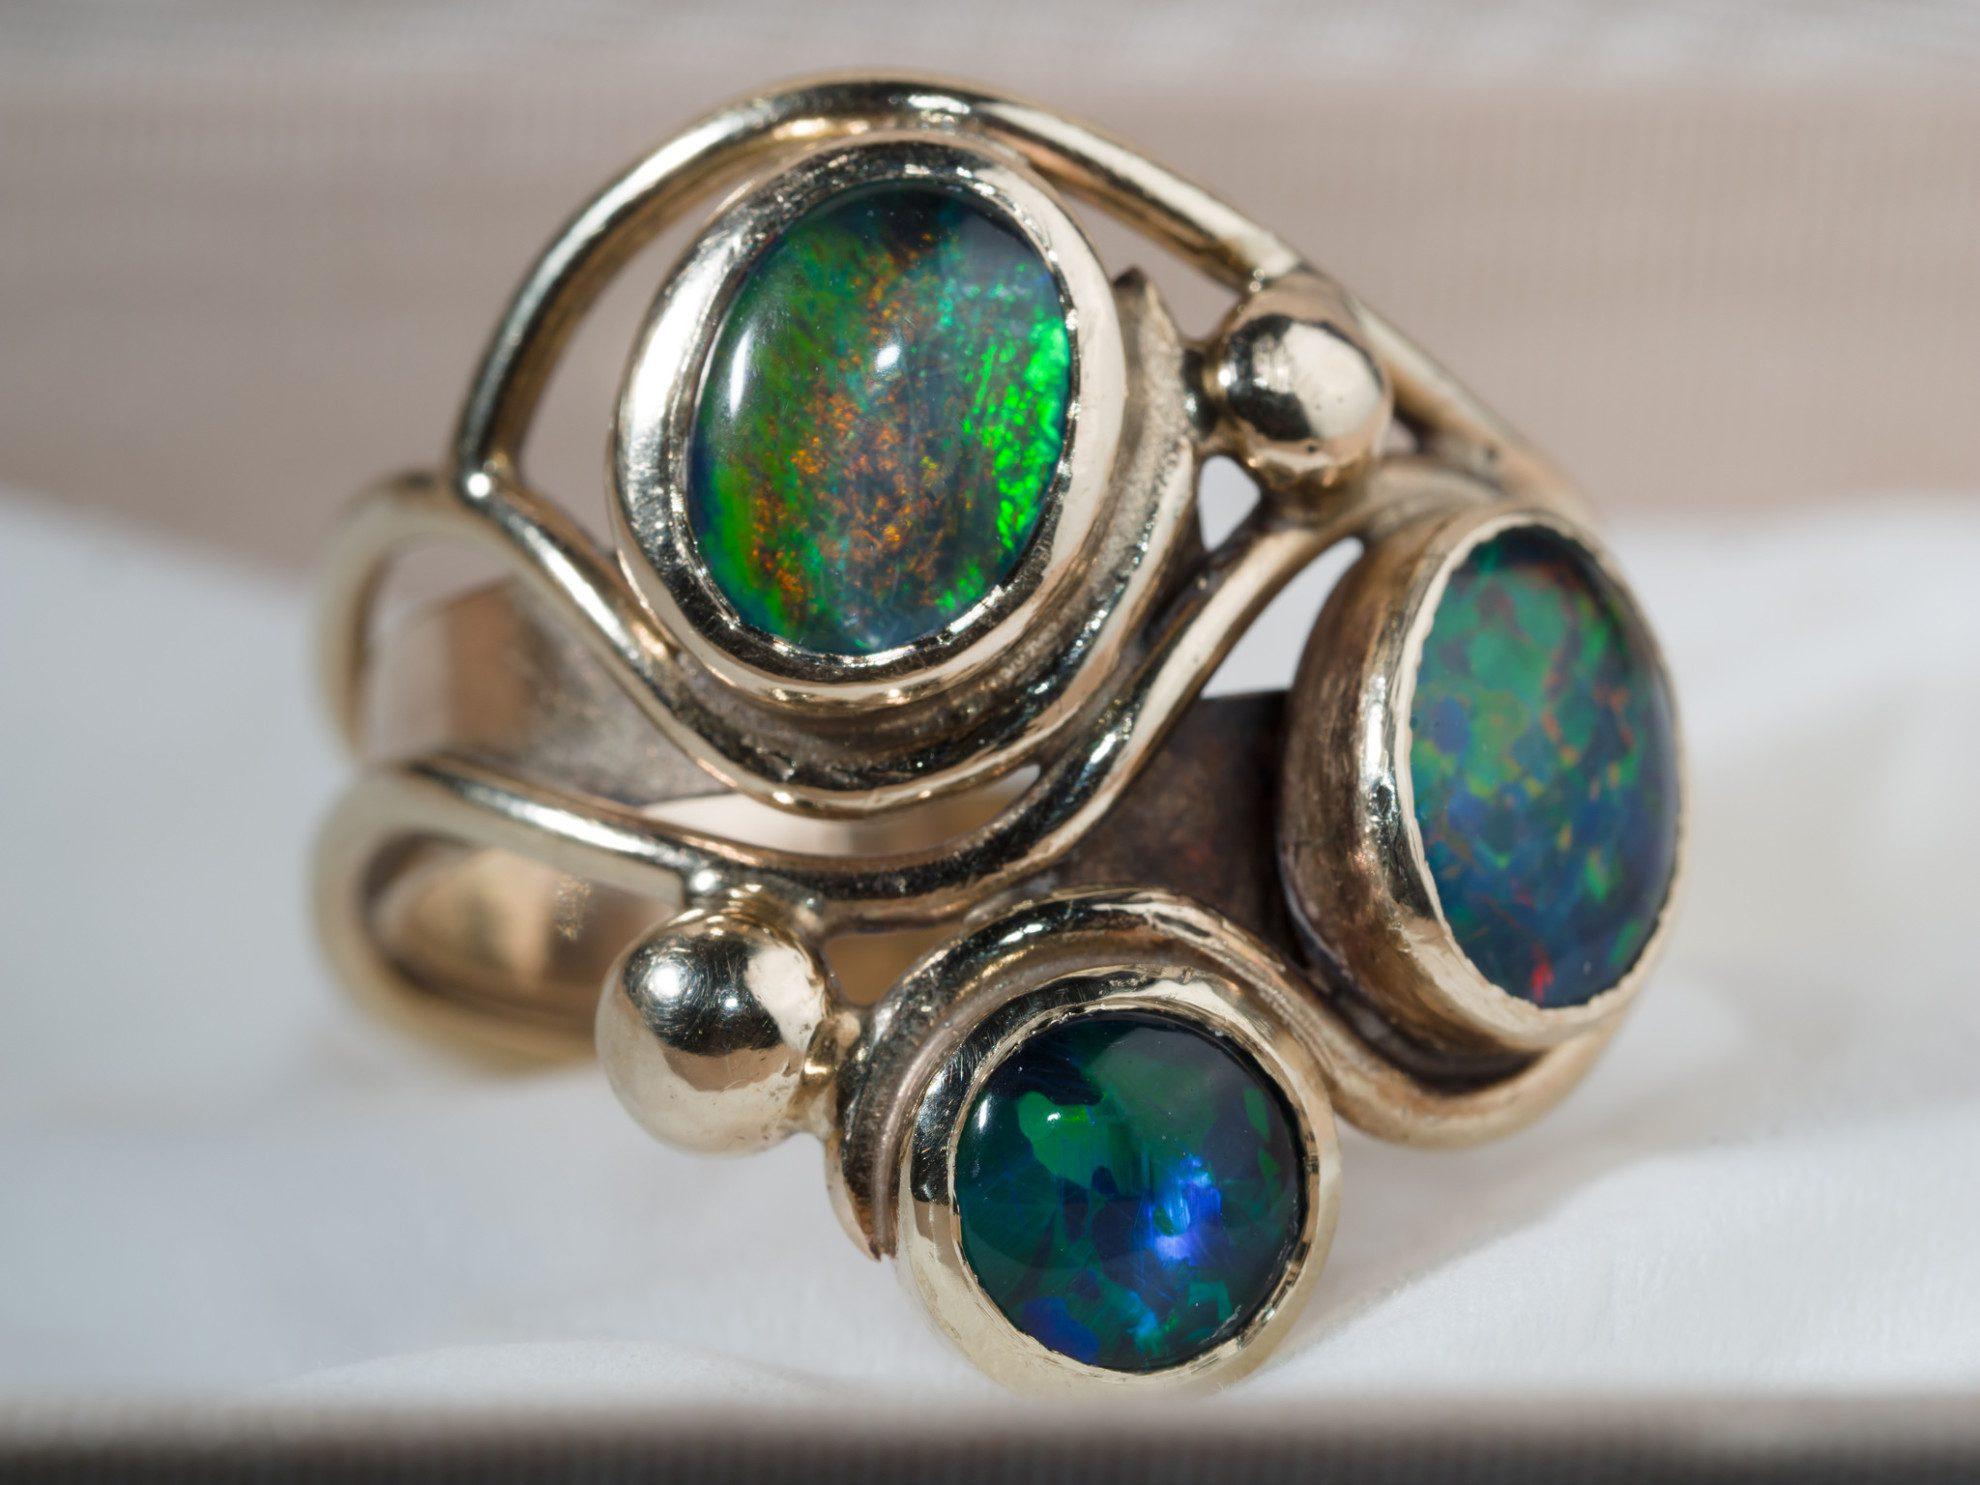 bezel-set opals - protective gem settings